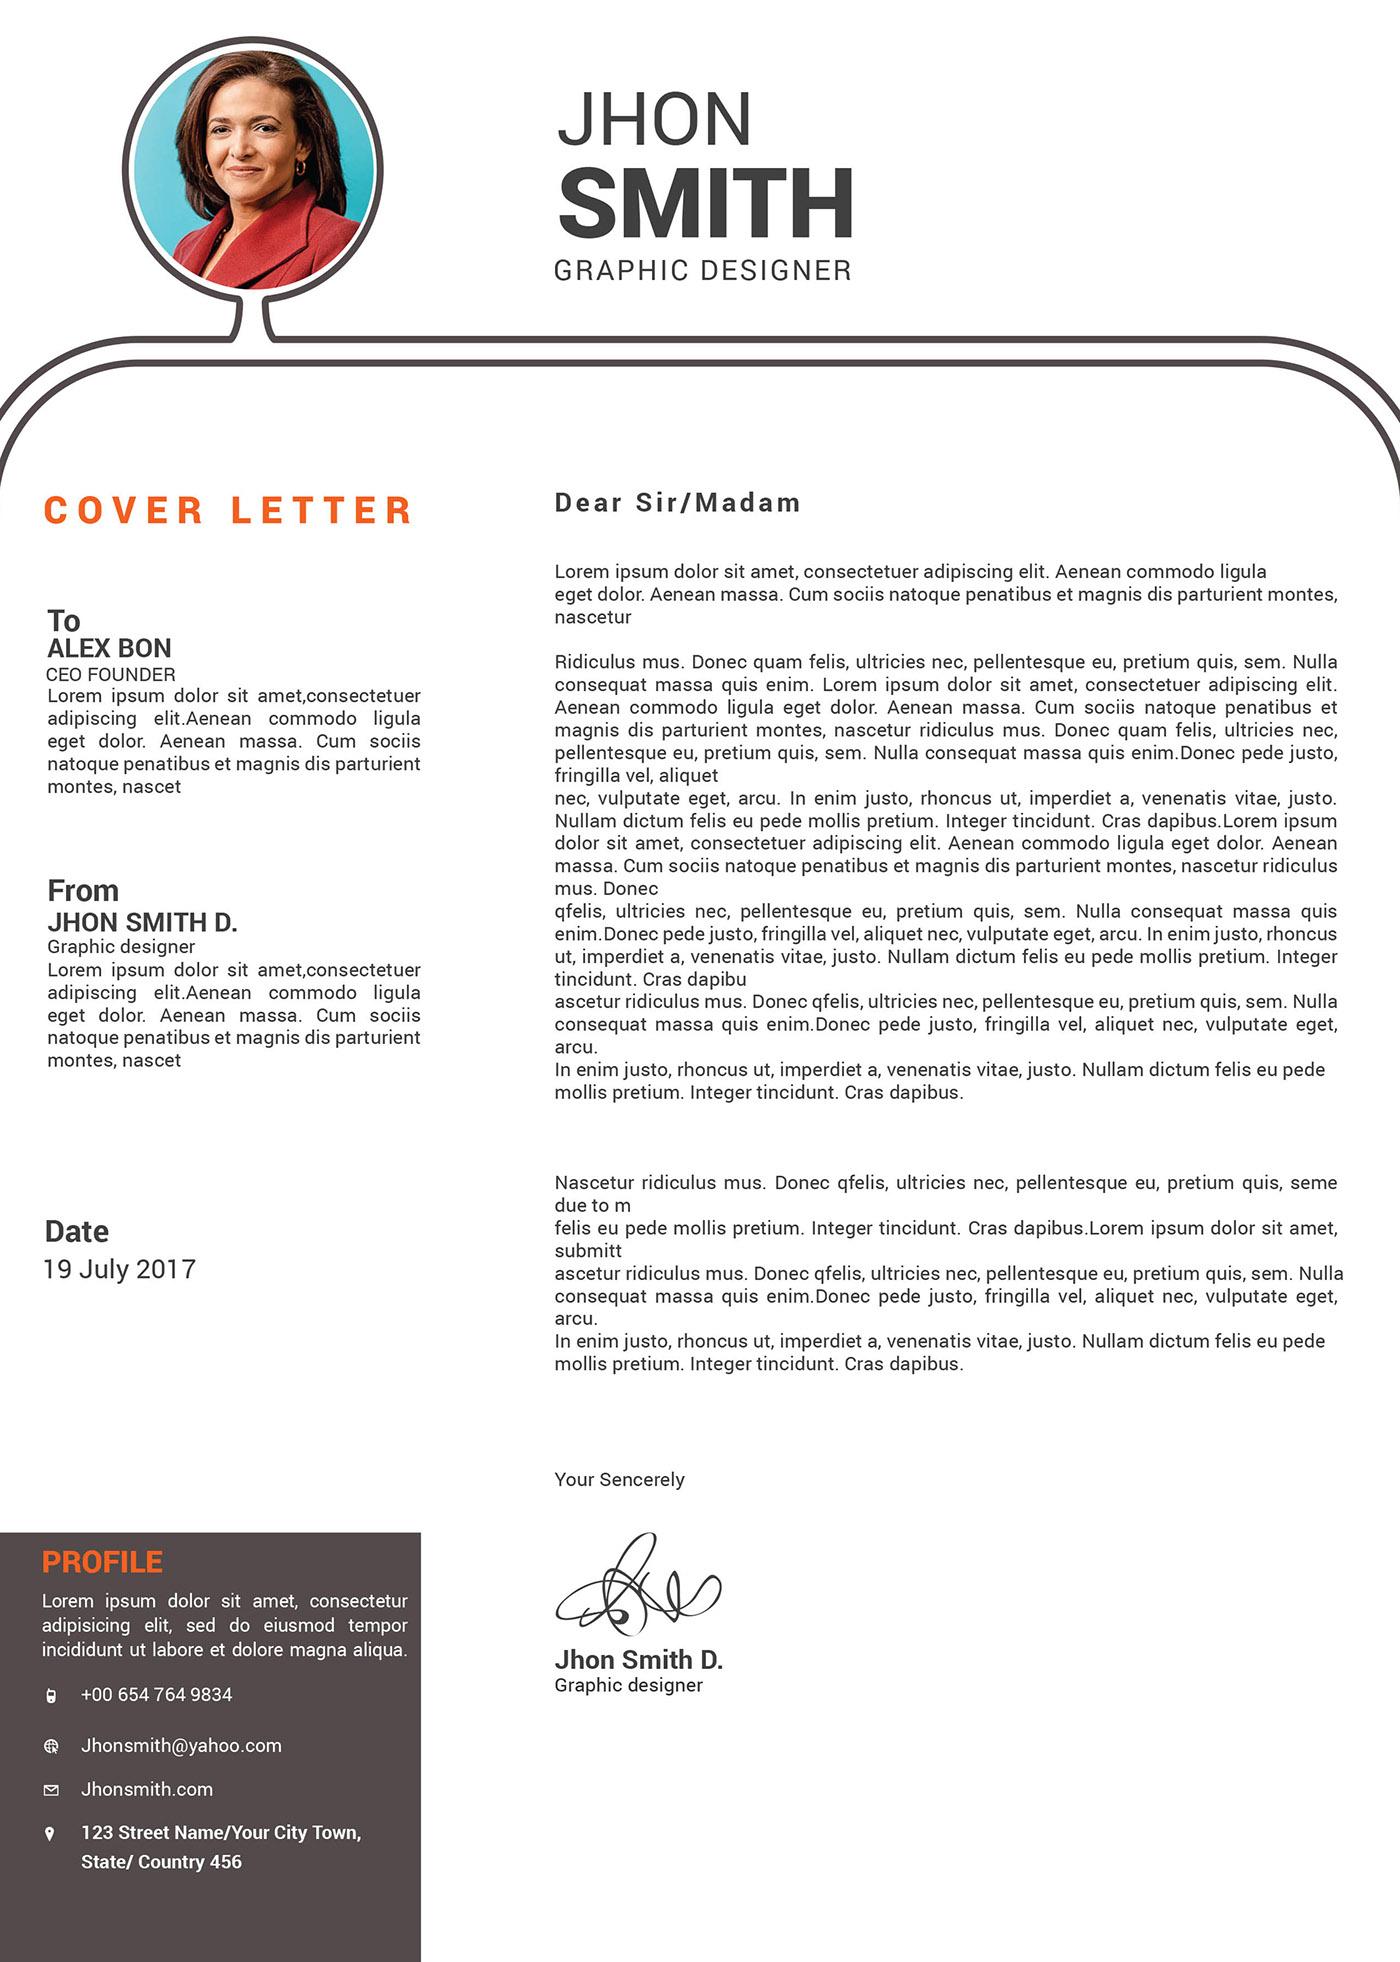 CV,a4,us letter,Resume,Creative Resume,Curriculum Vita,template,branding ,Advertising